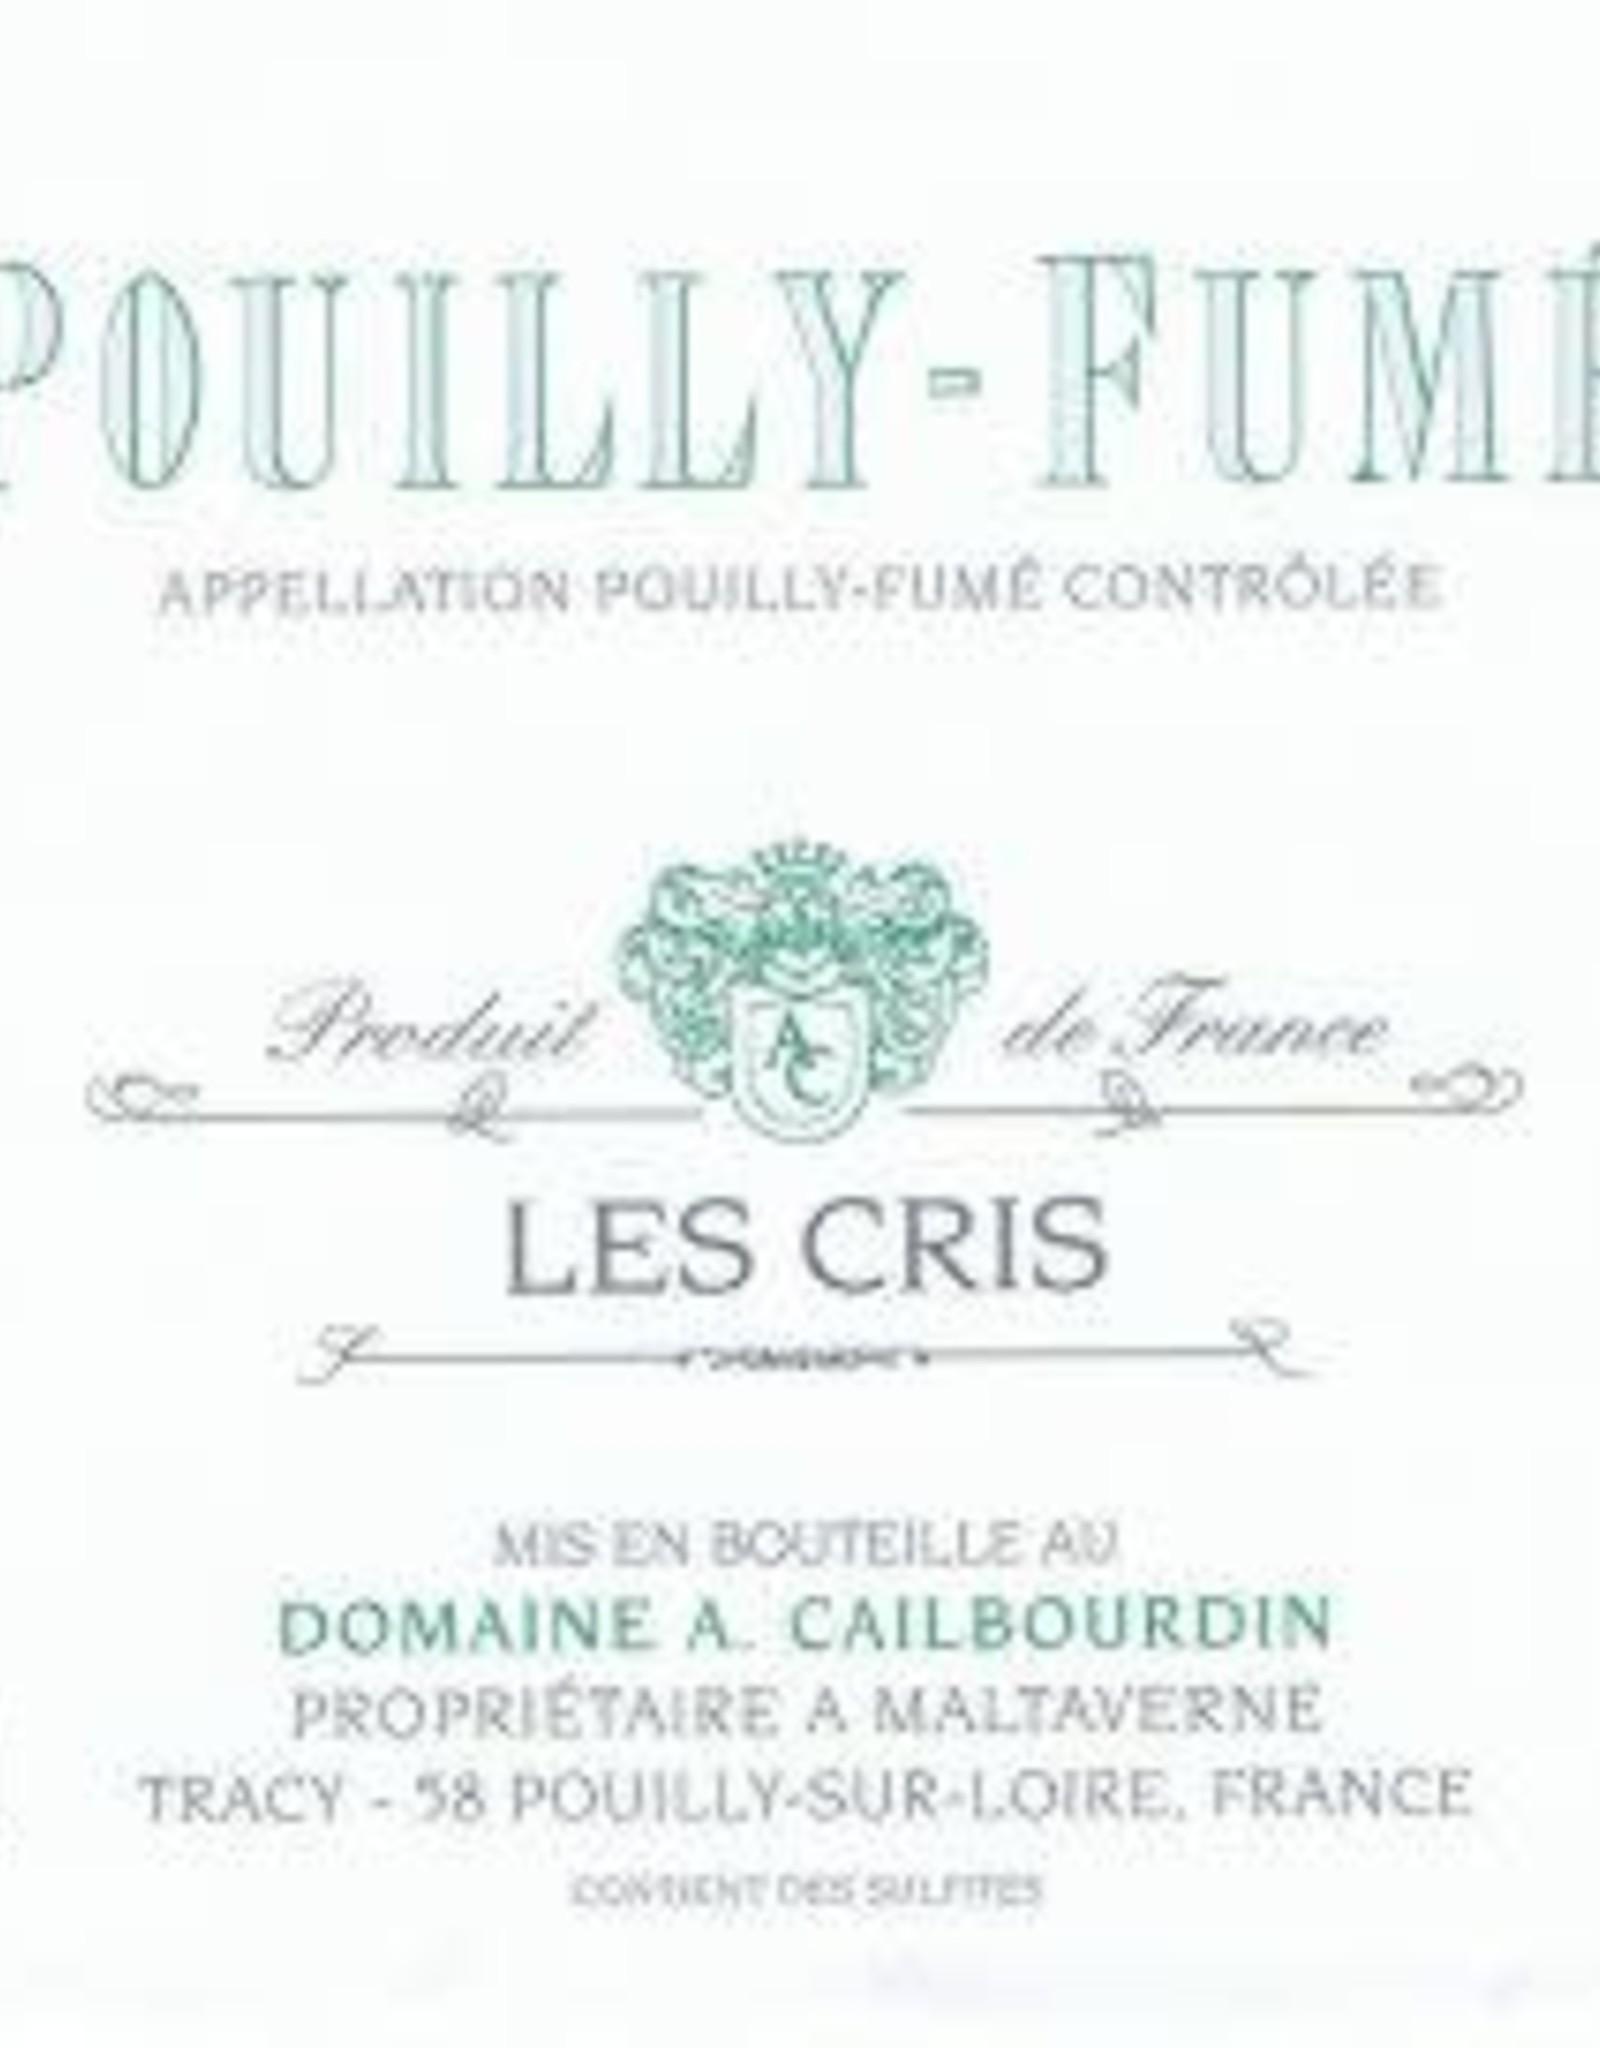 Wine-White Pouilly-Fume, LES CRIS, Alain Cailbourdin 2018 (375 ml)